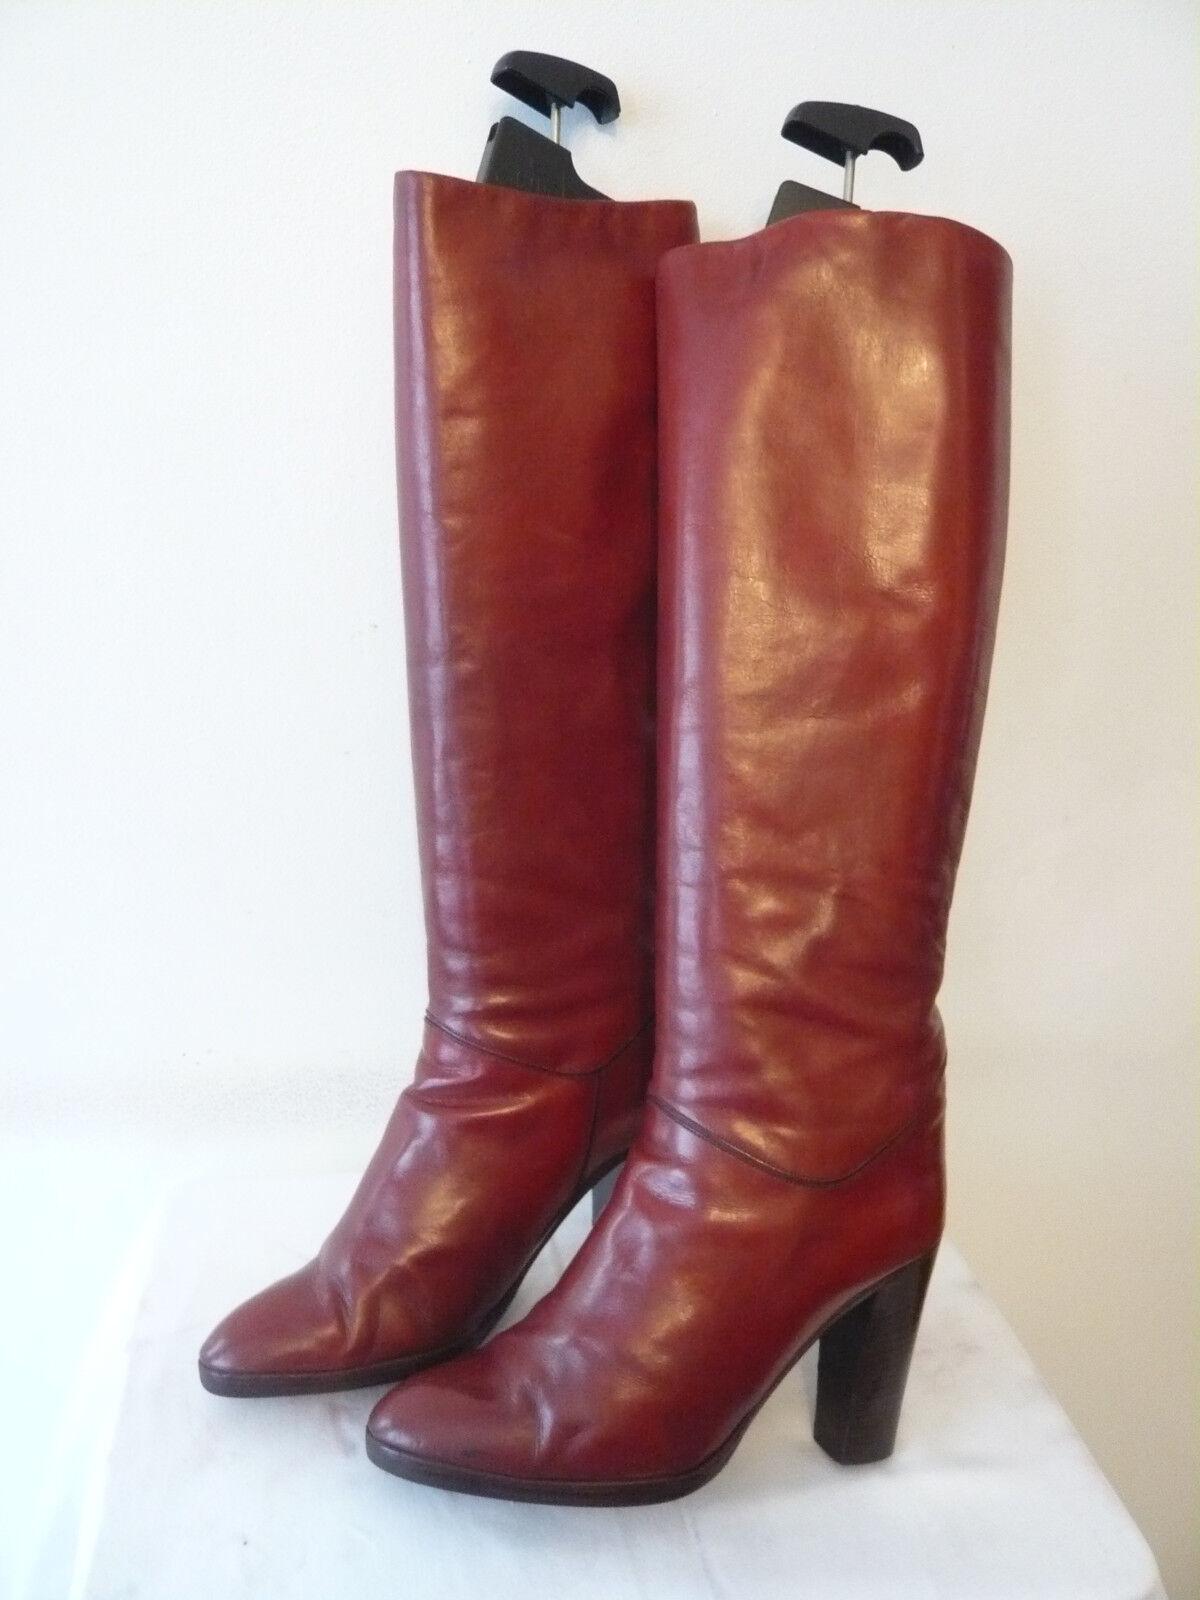 "Stiefel vintage 1982 ""Bordeaux-Rot ""ii - CHARLES Jourdan Design t.35,5"